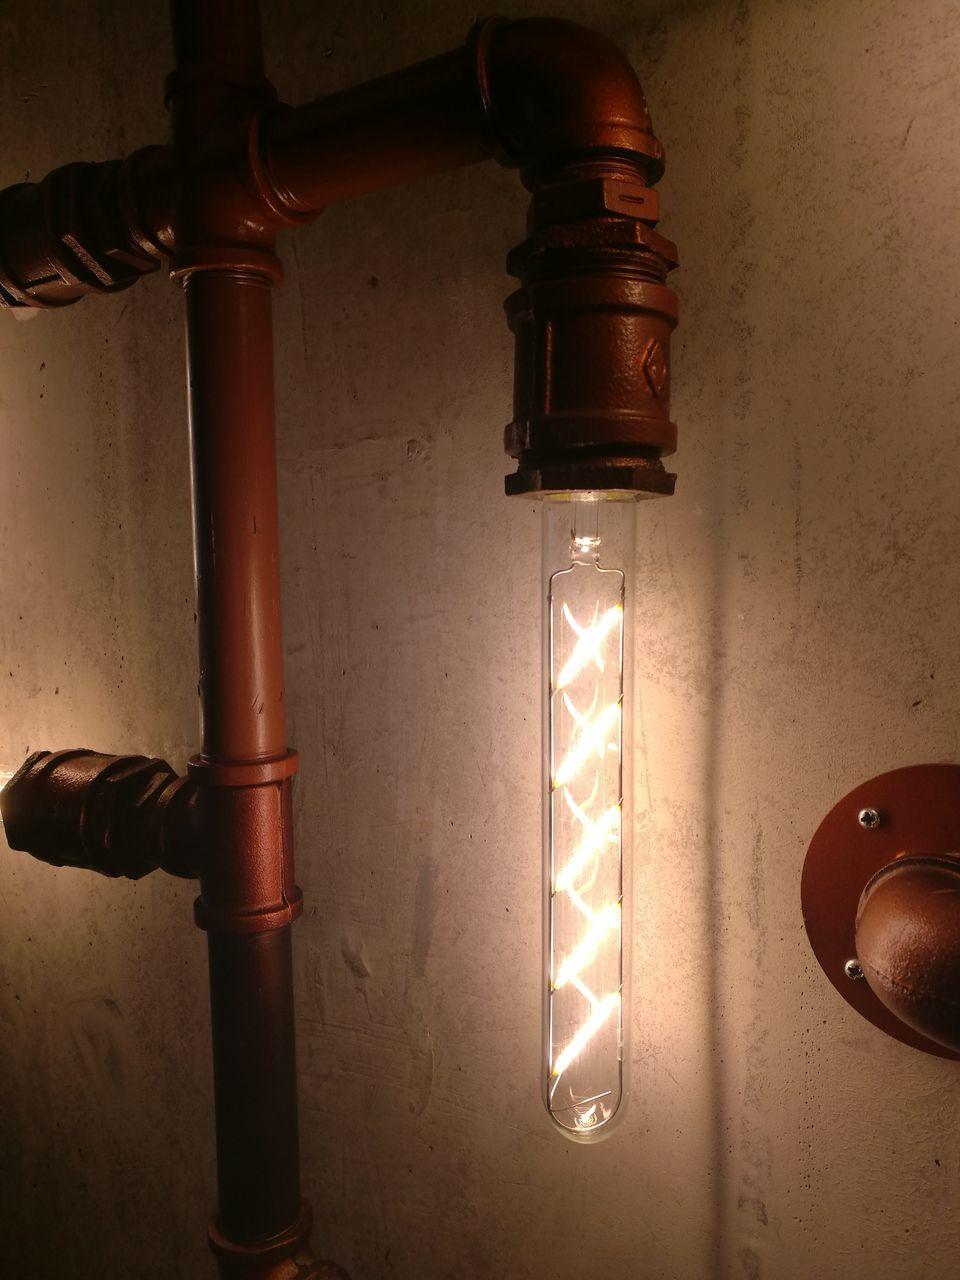 illuminated, indoors, lighting equipment, close-up, no people, technology, day